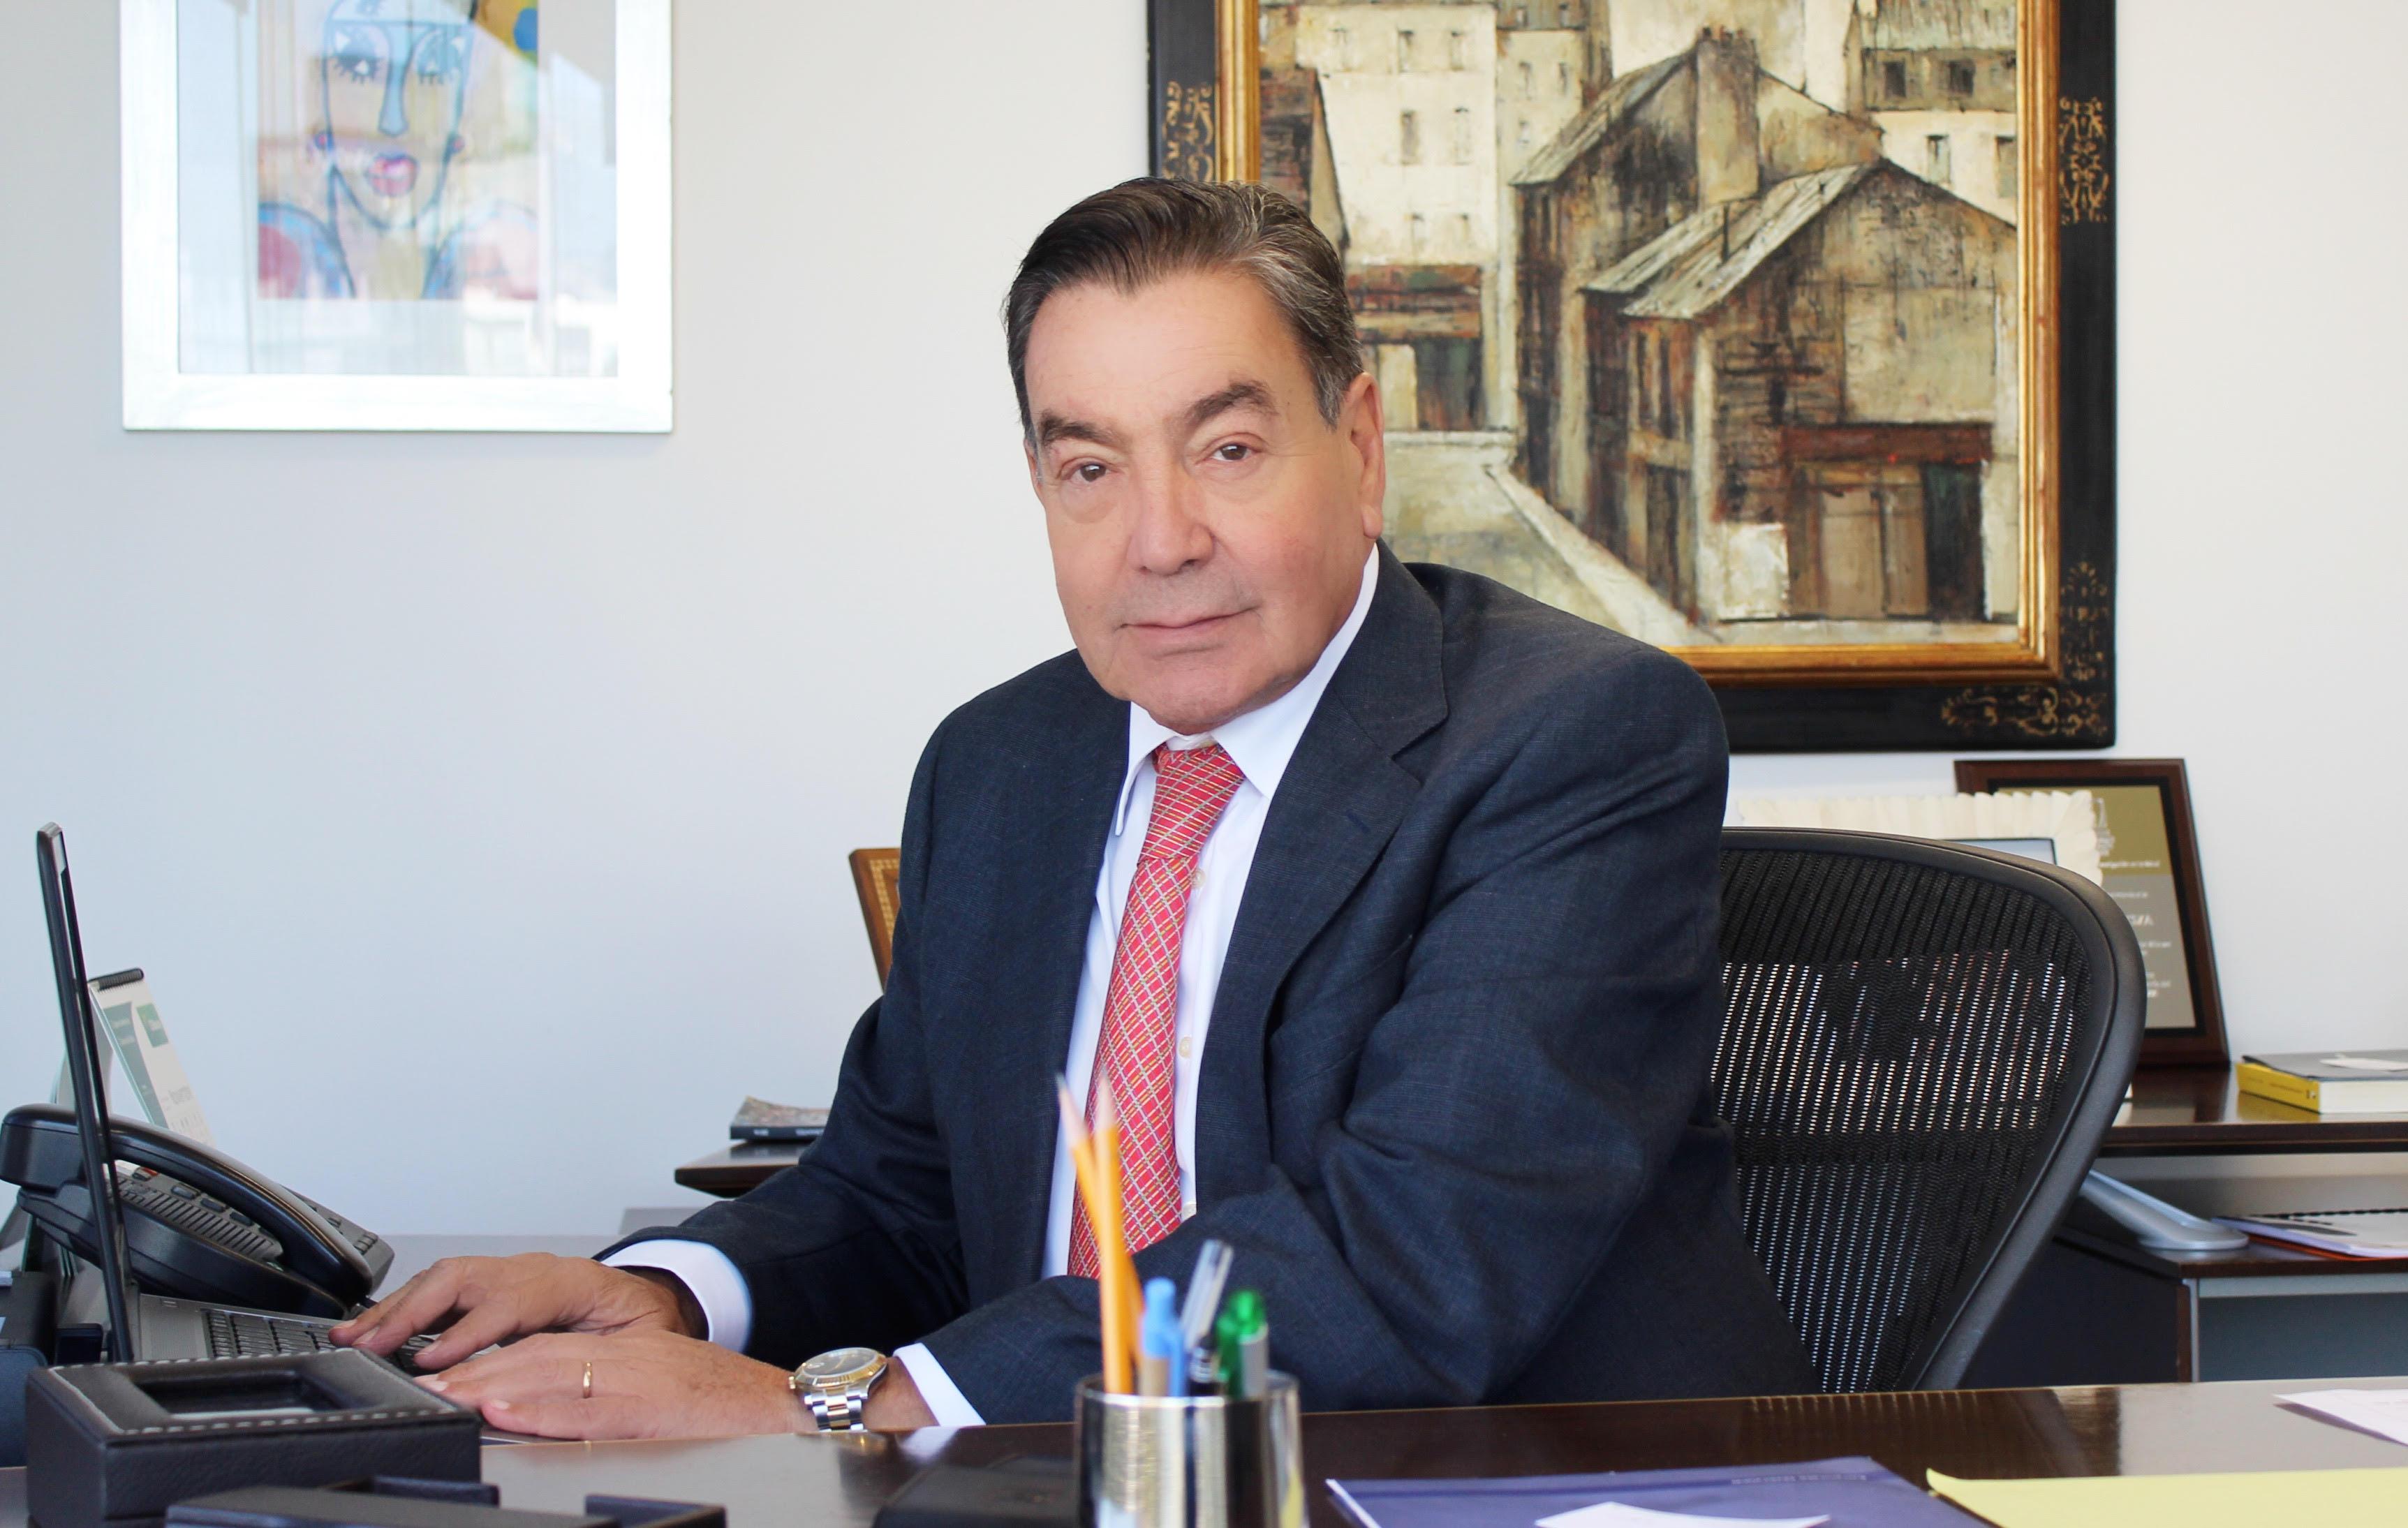 Manuel Somoza